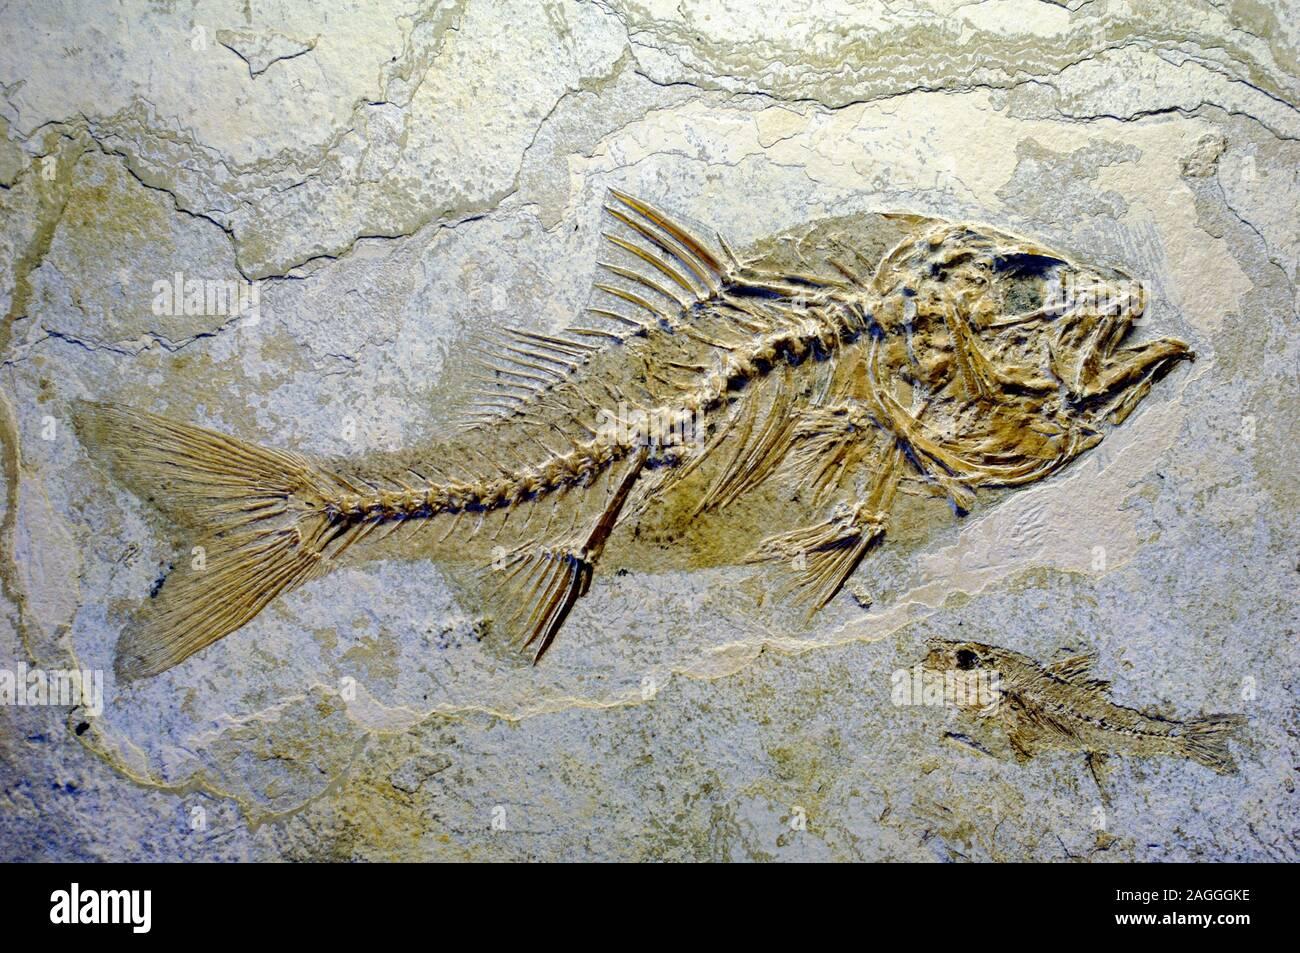 Dapalis macrurus Oligocène poissons fossiles préhistoriques disparues Poisson Ray-Finned Banque D'Images